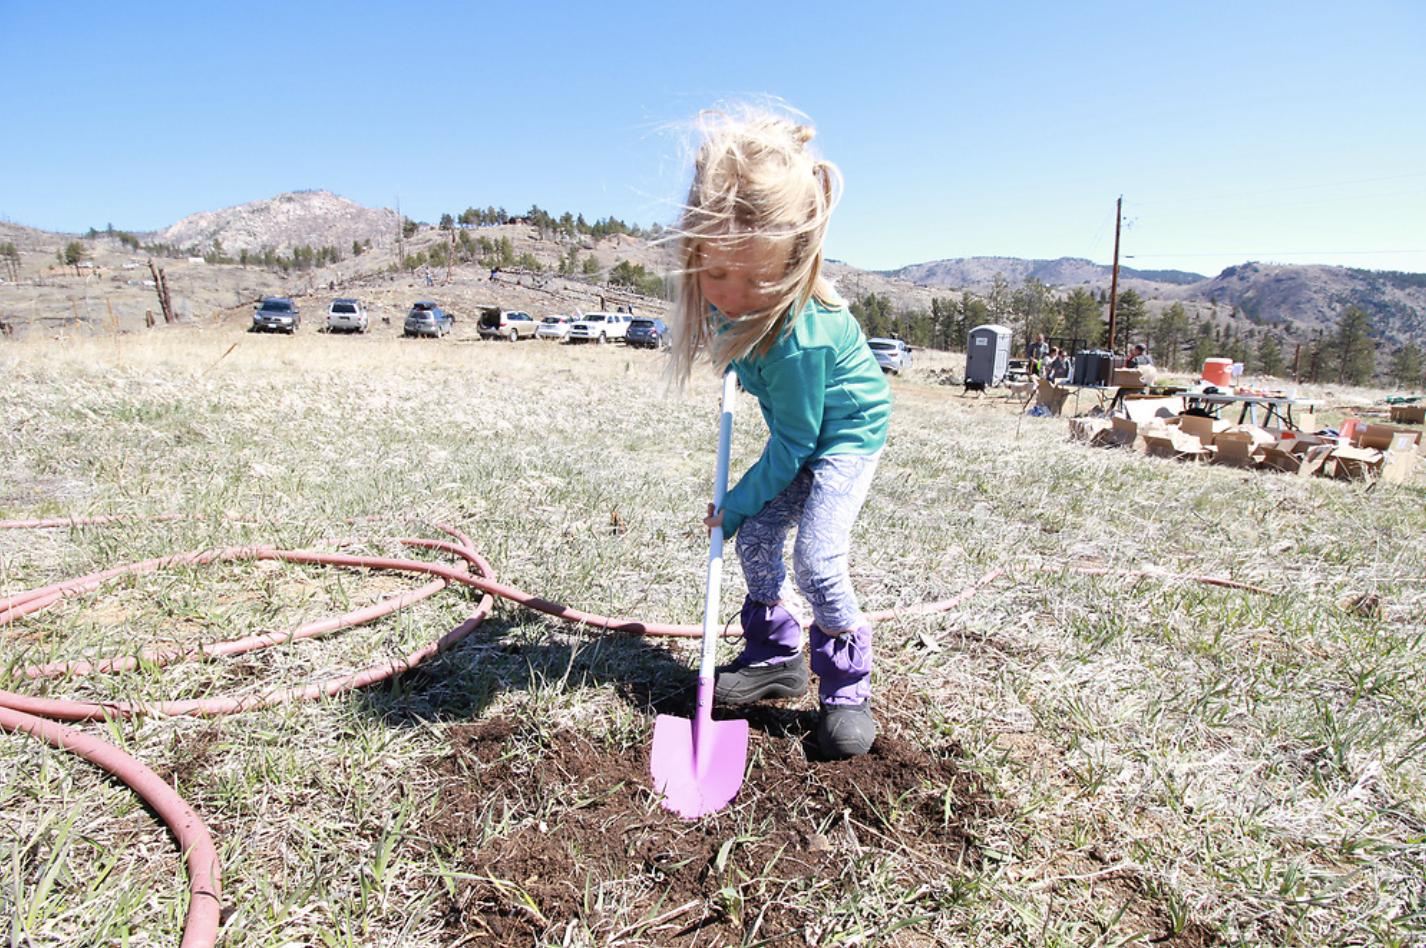 little girl with pink shovel